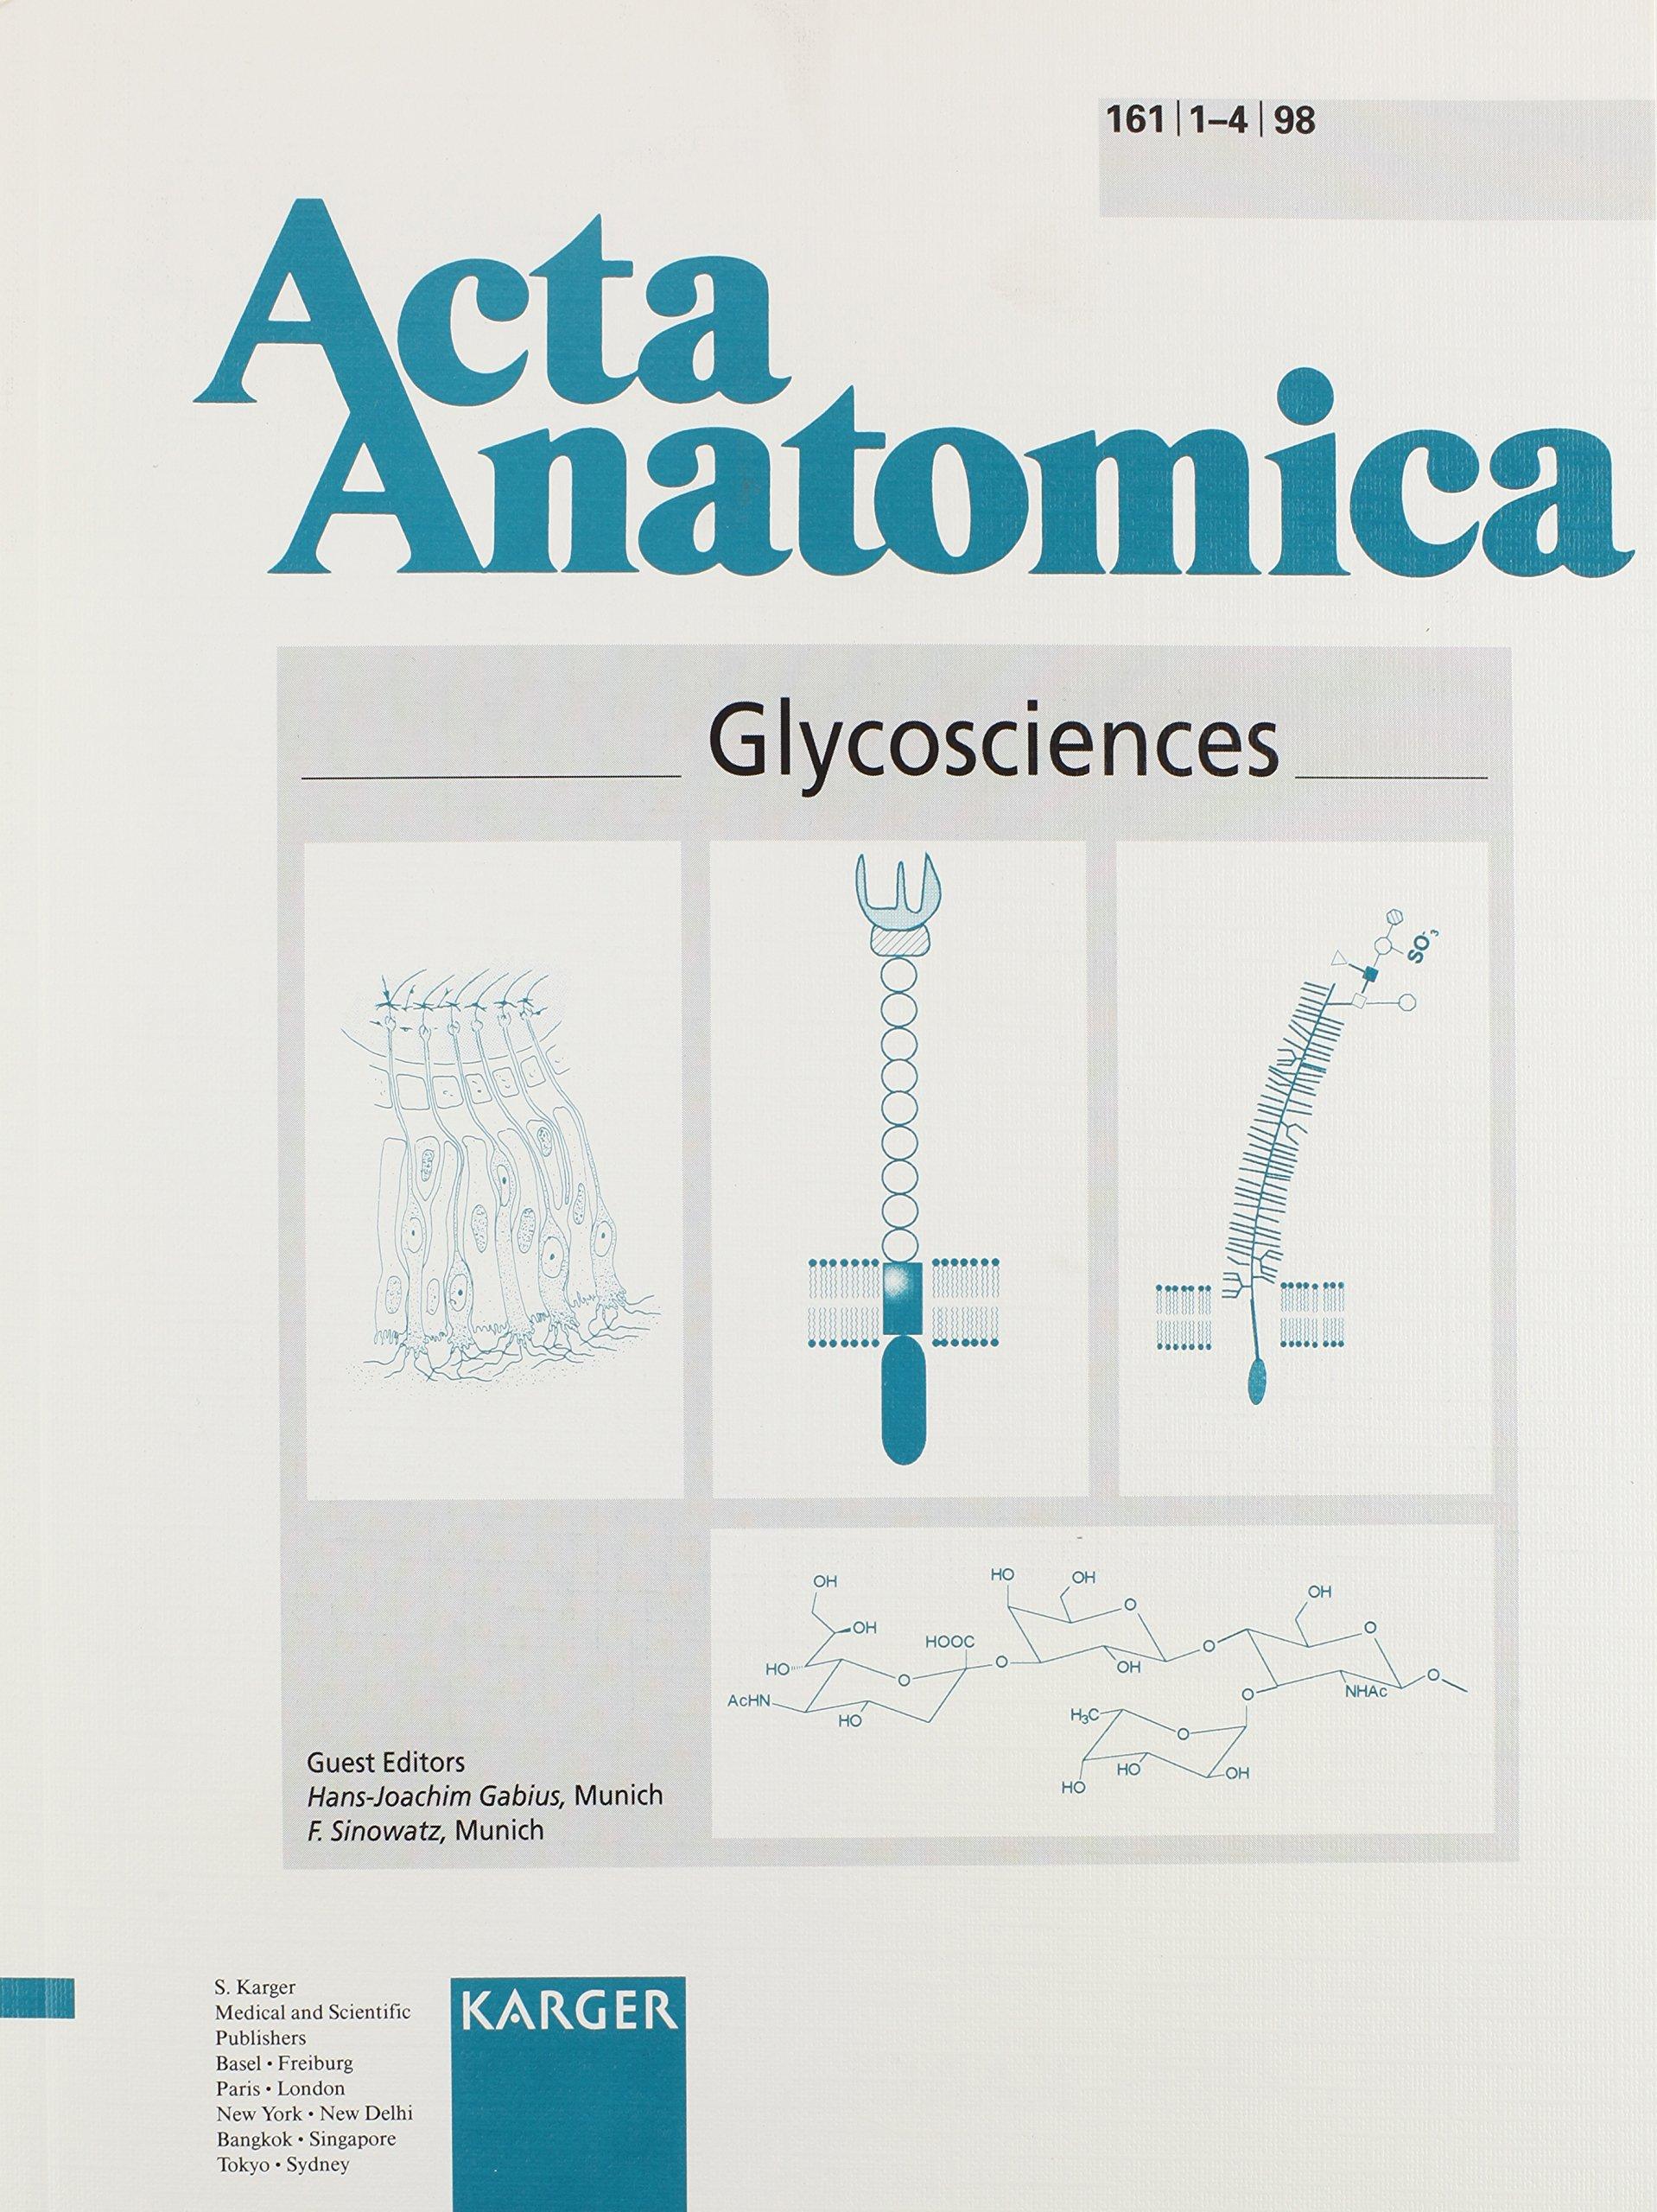 Glycosciences (Acta Anatomica, Volume 161, Numbers 1-4, 1998)